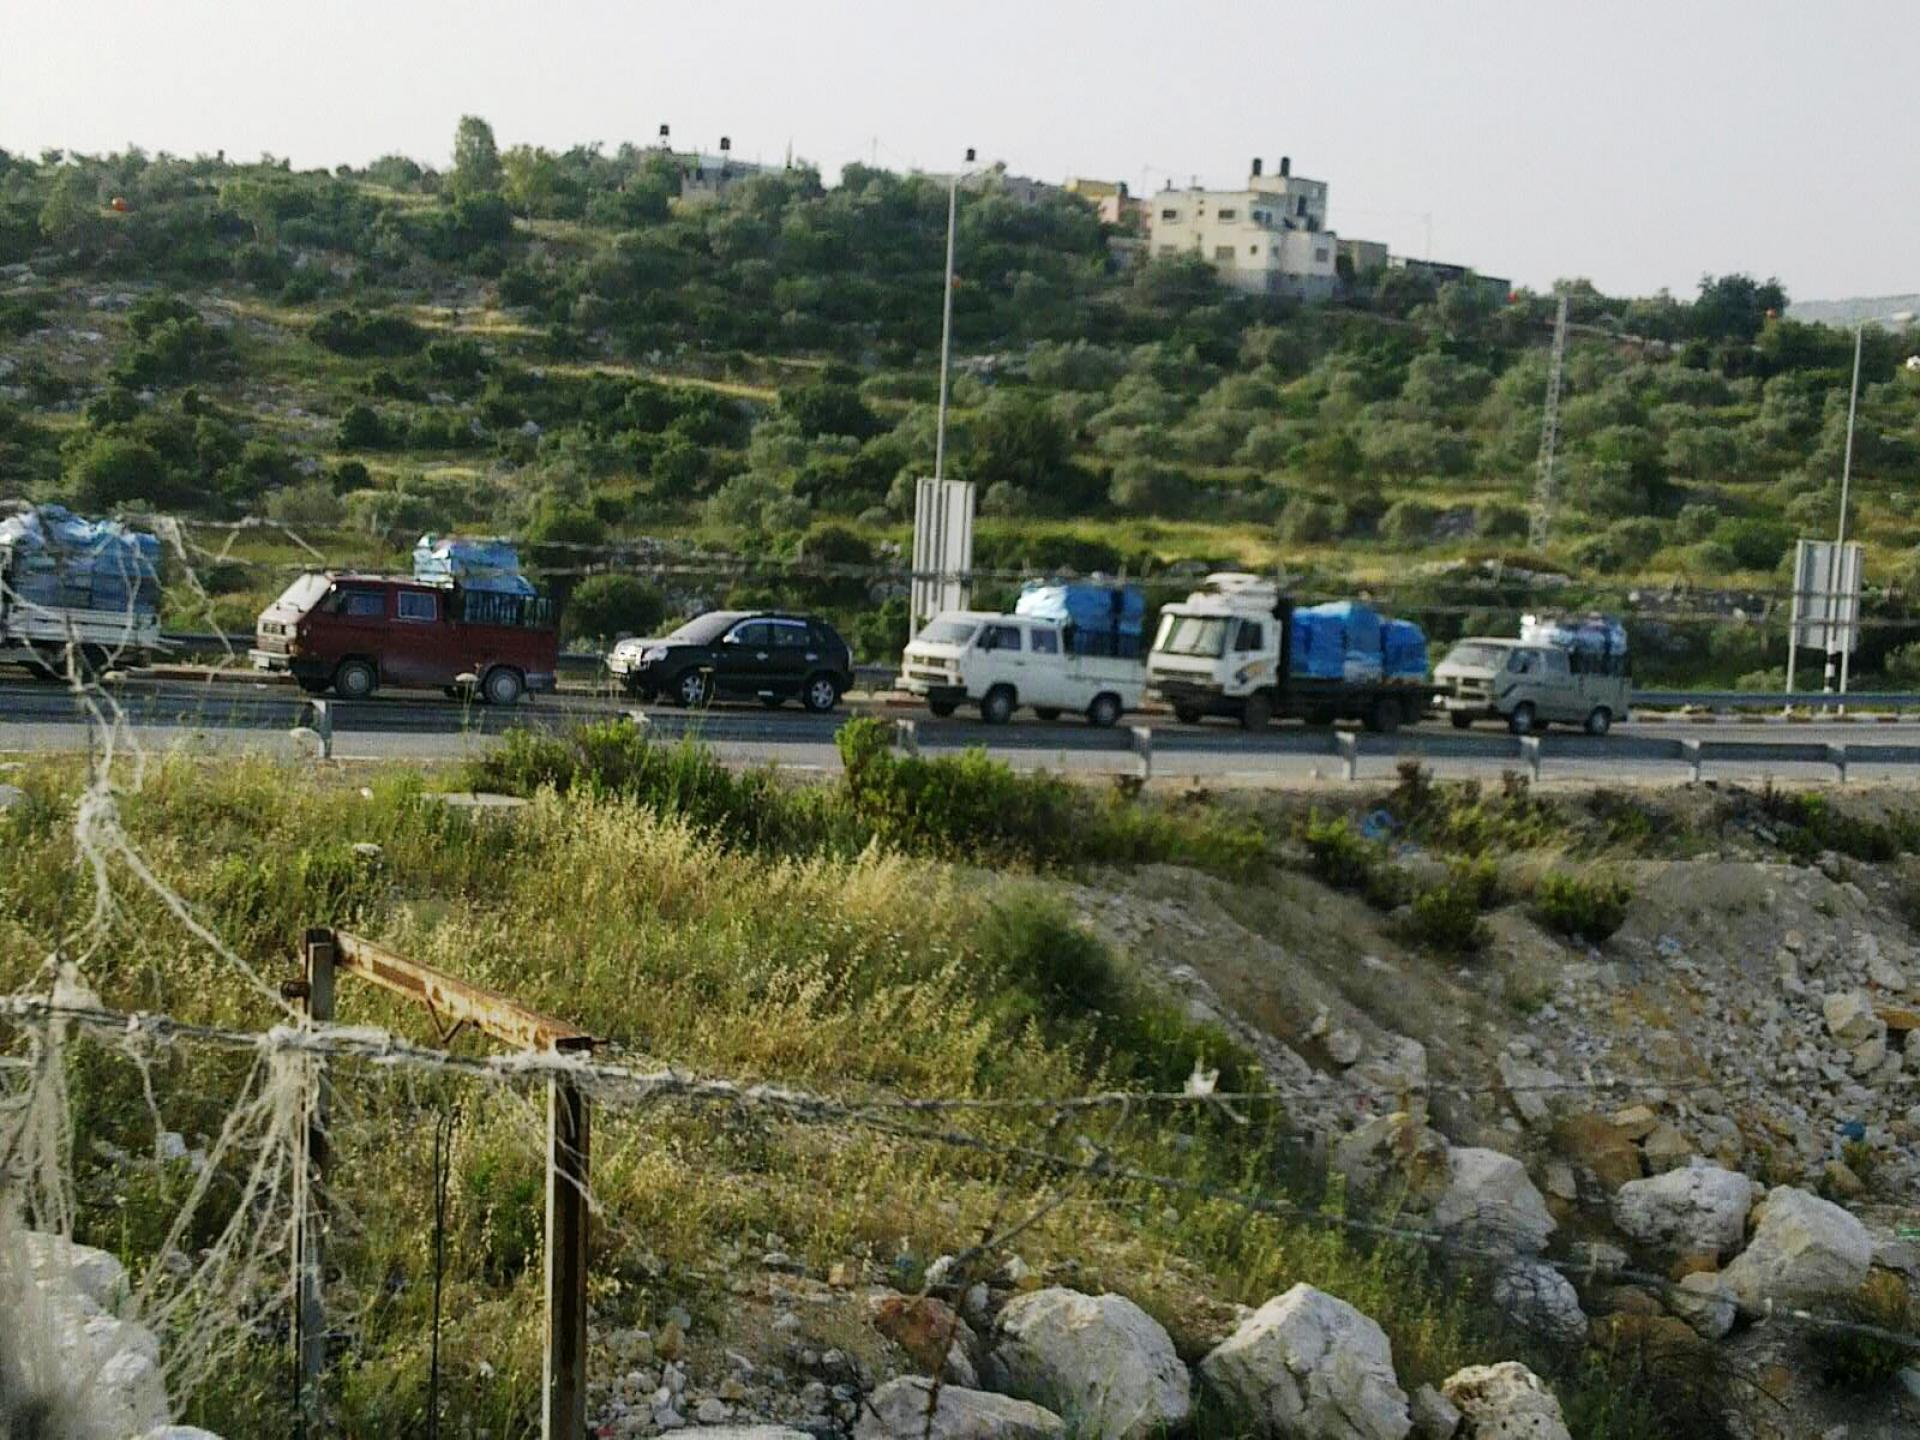 Barta'a/Reikhan Checkpoint 05.05.11